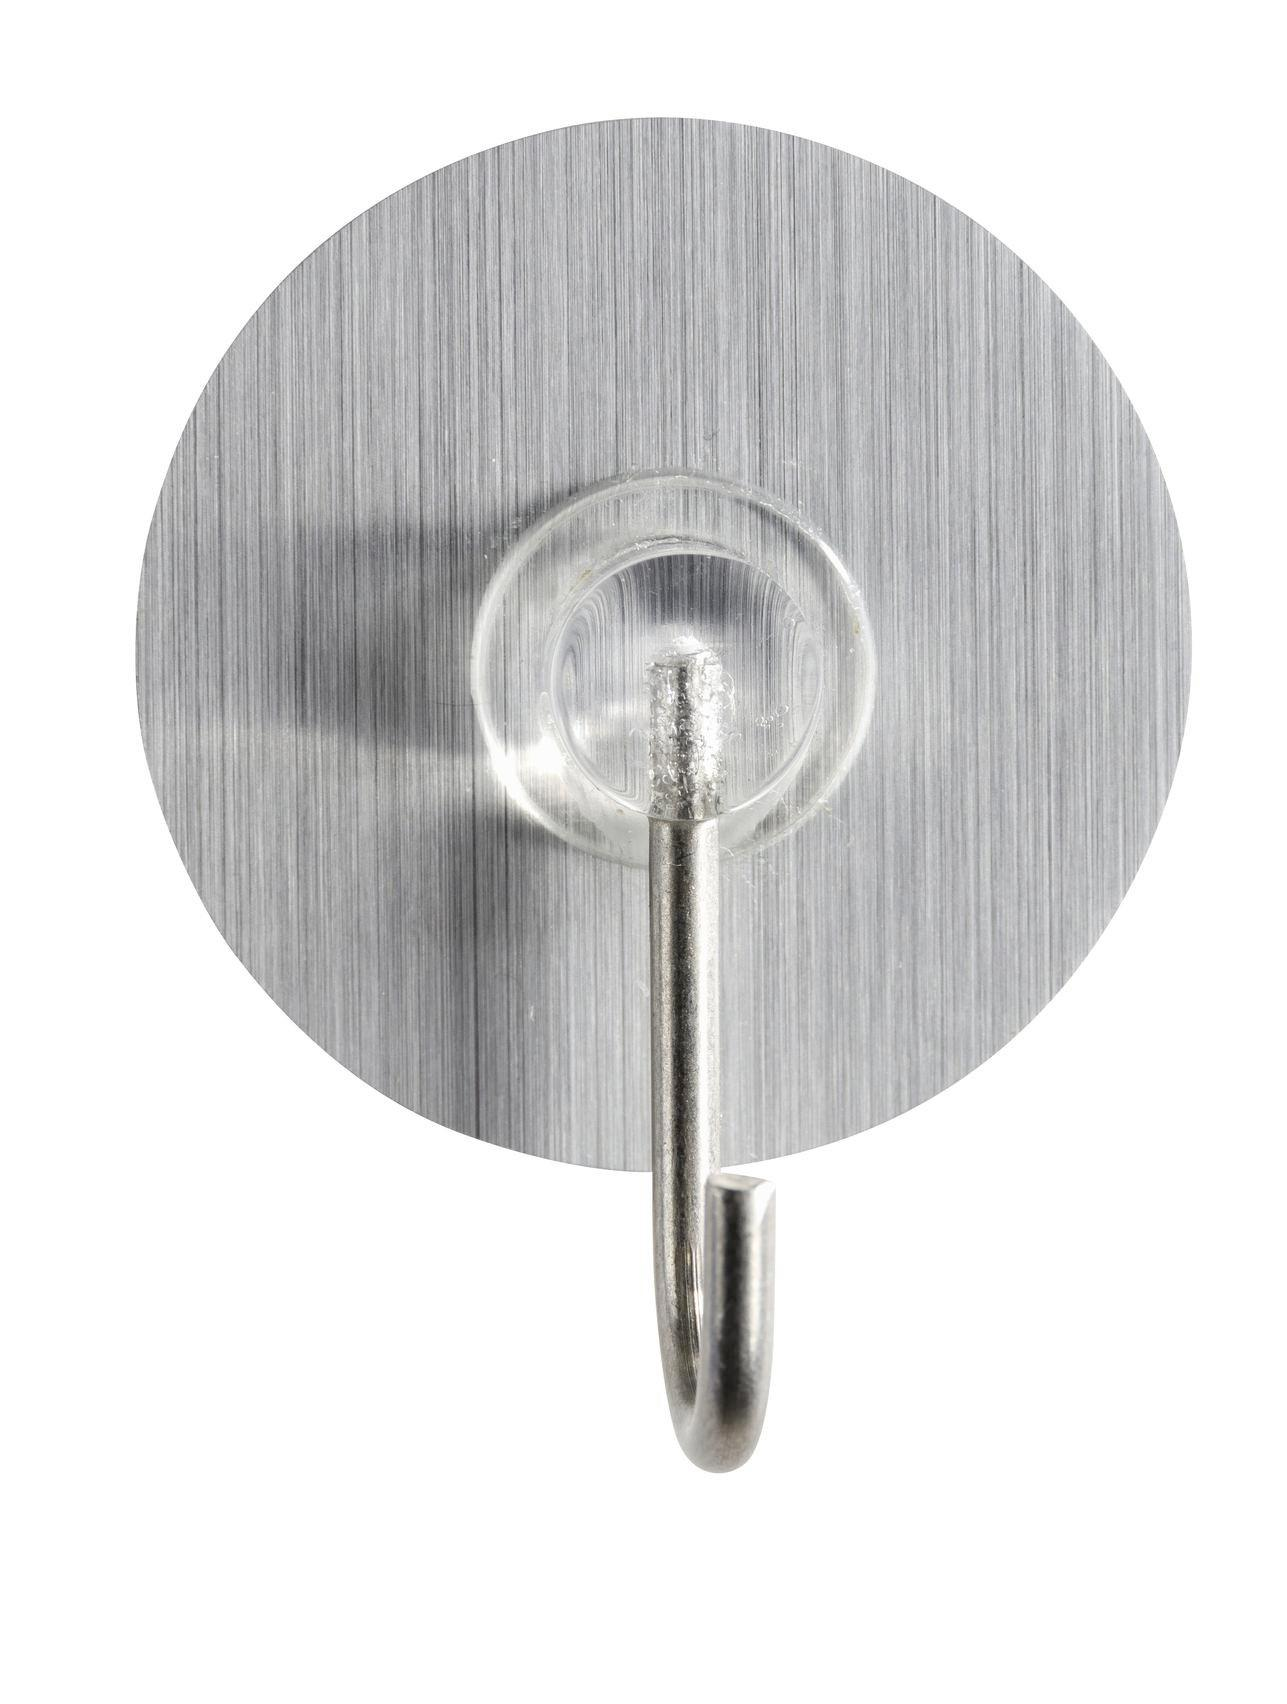 Wandhaken in Silberfarben - Silberfarben, MODERN, Kunststoff (3,8cm) - MÖMAX modern living